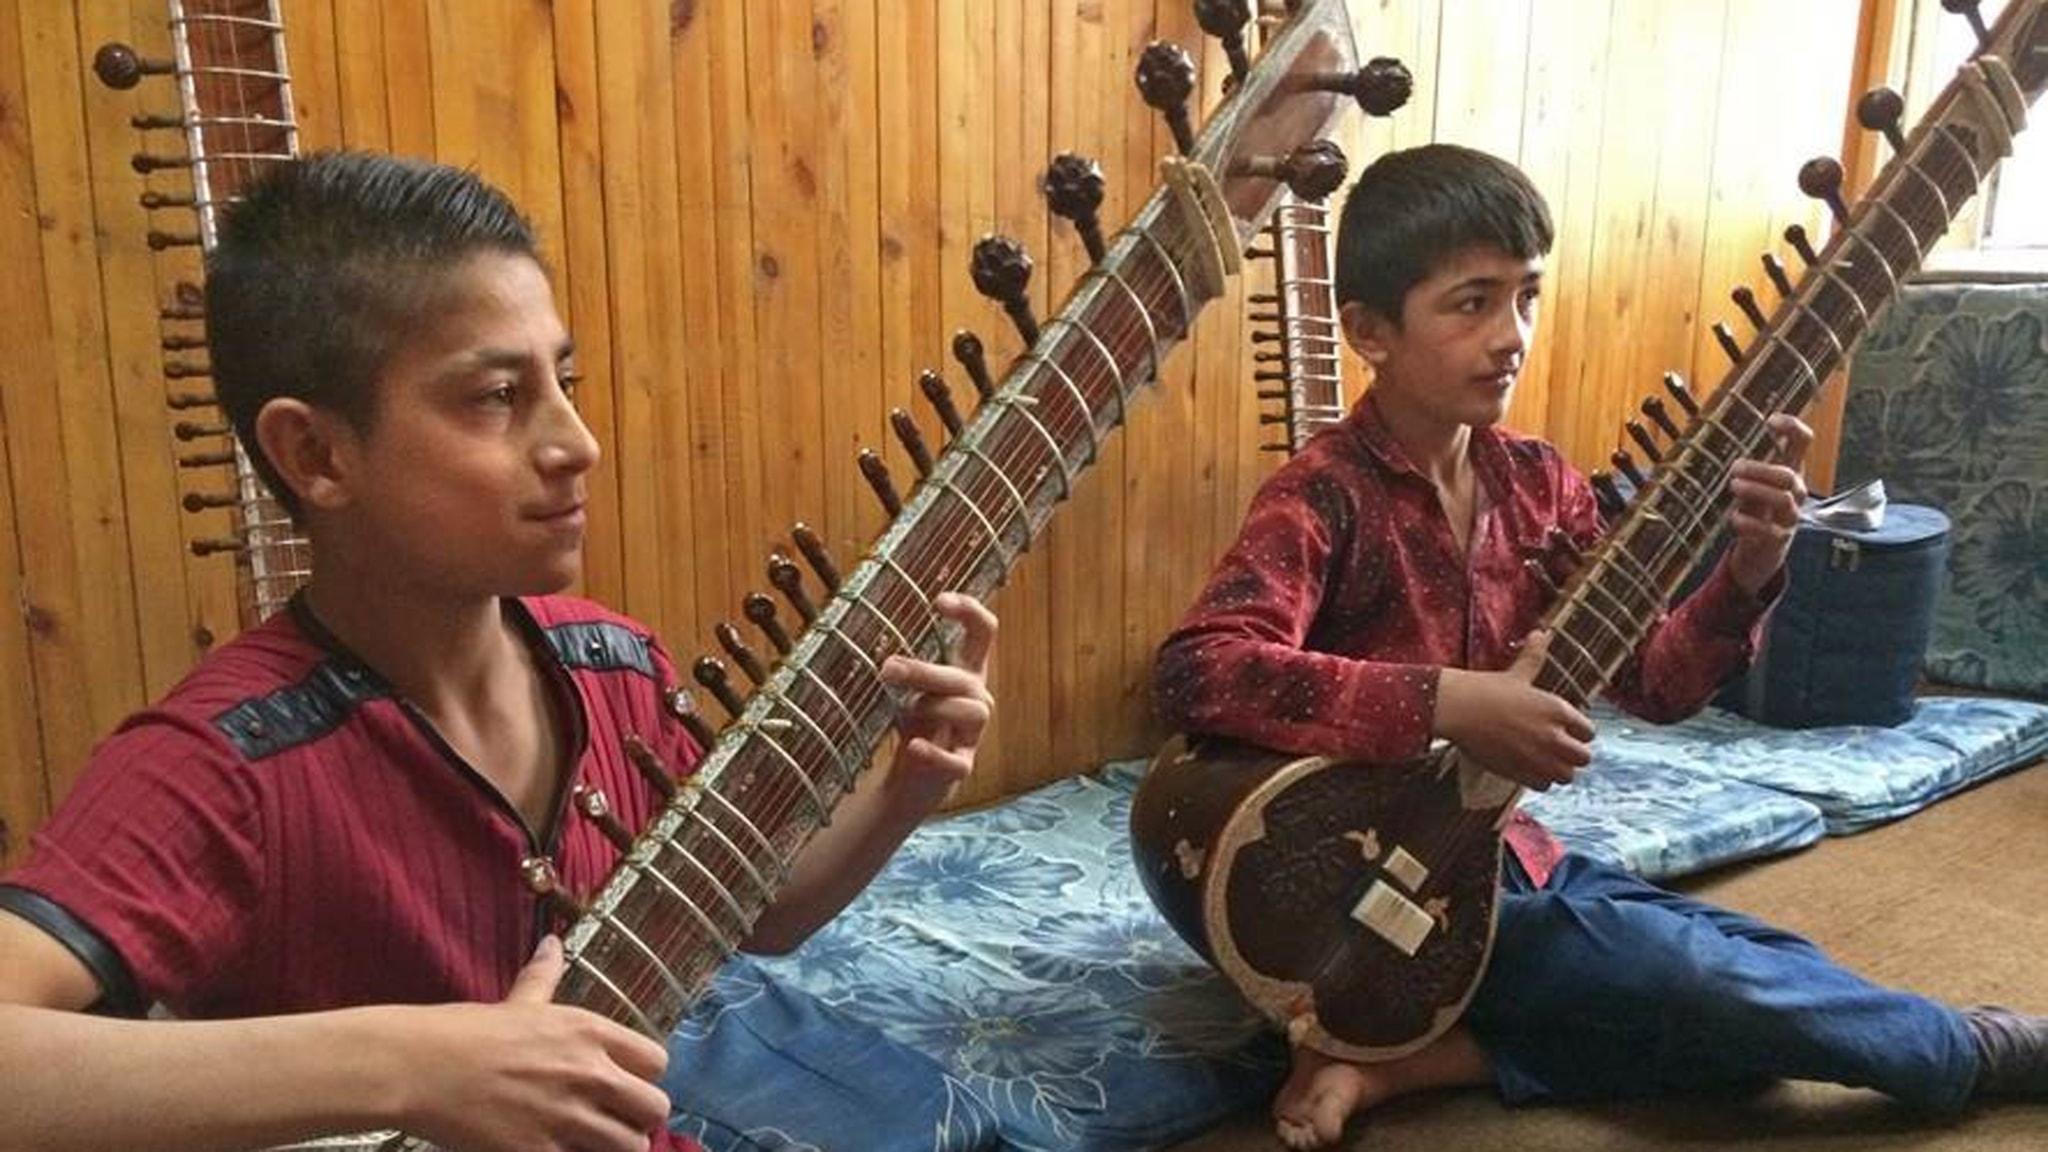 Prisat musikinstitut i Afghanistan trotsar bombdåd